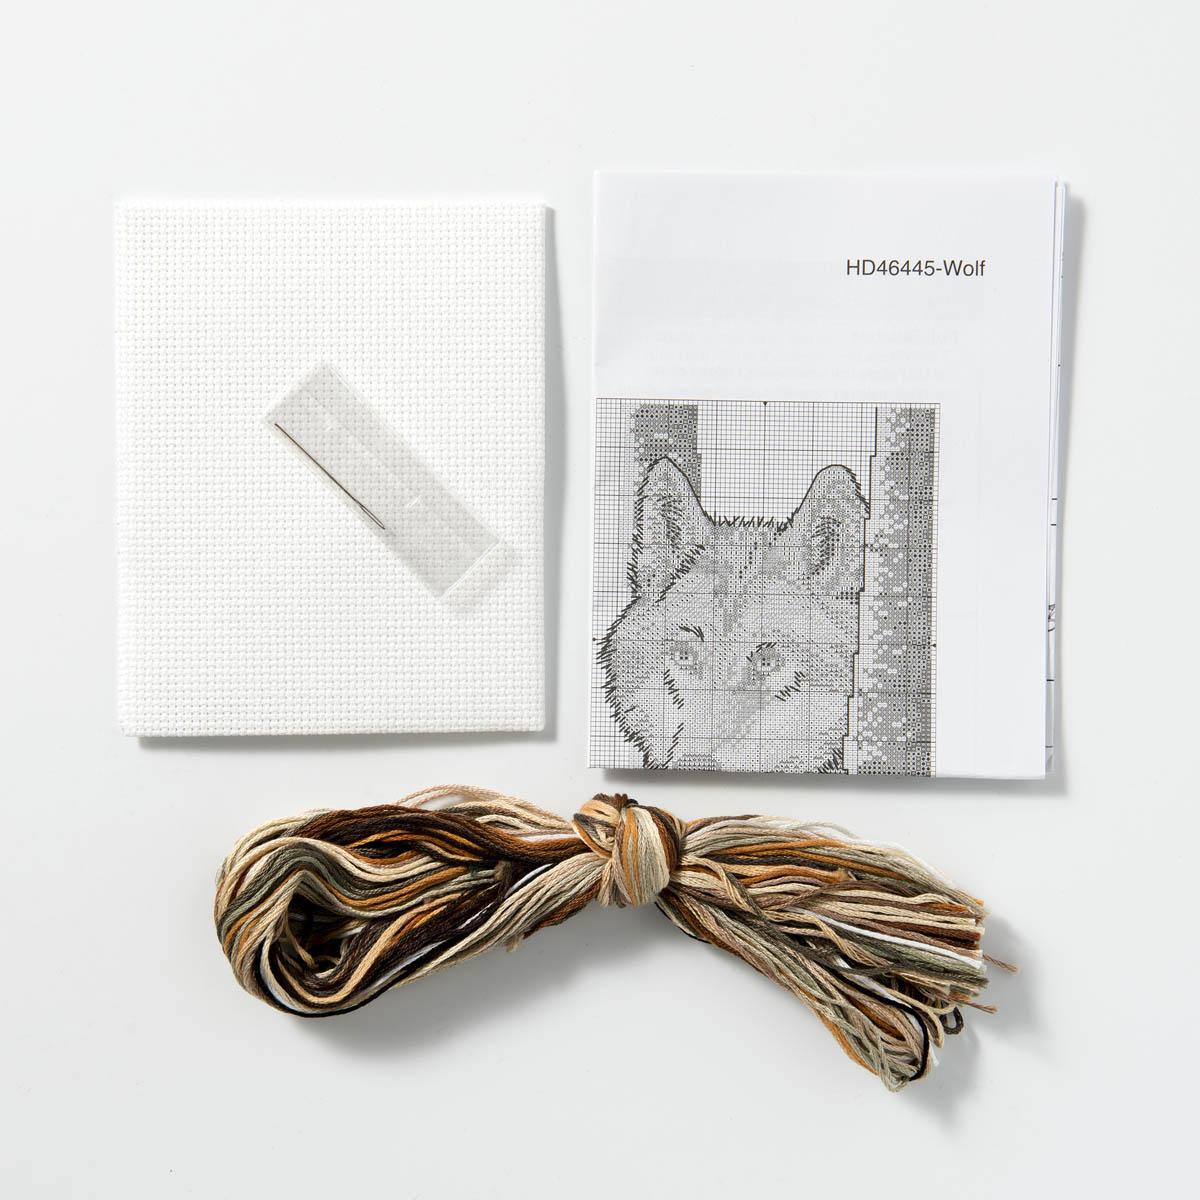 Bucilla ® Counted Cross Stitch - Picture Kits - Mini - Wolf